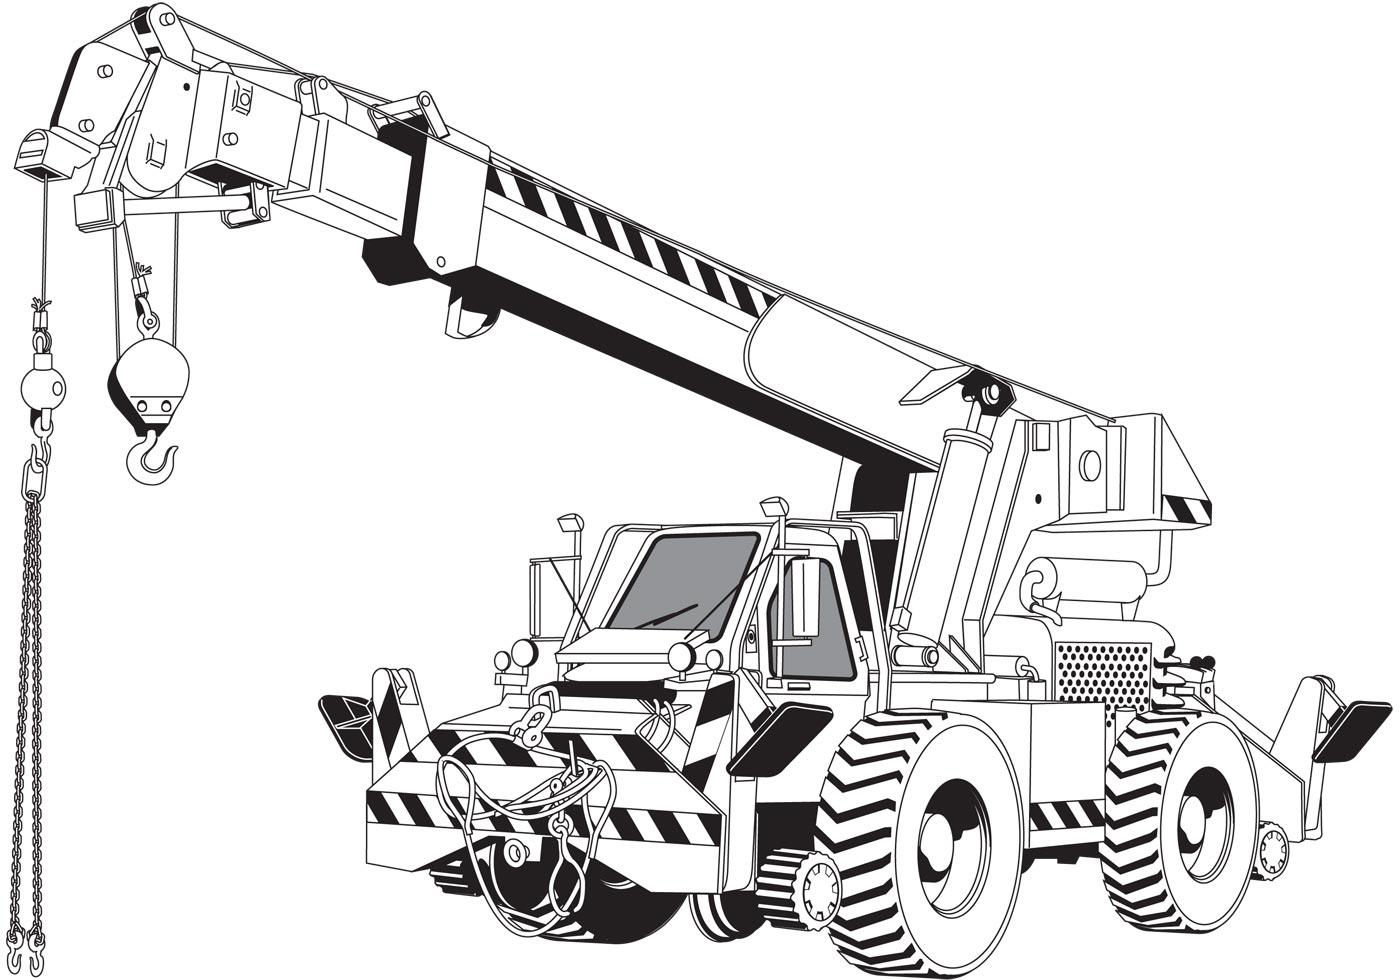 Free Vector Crane Vecteezy Com